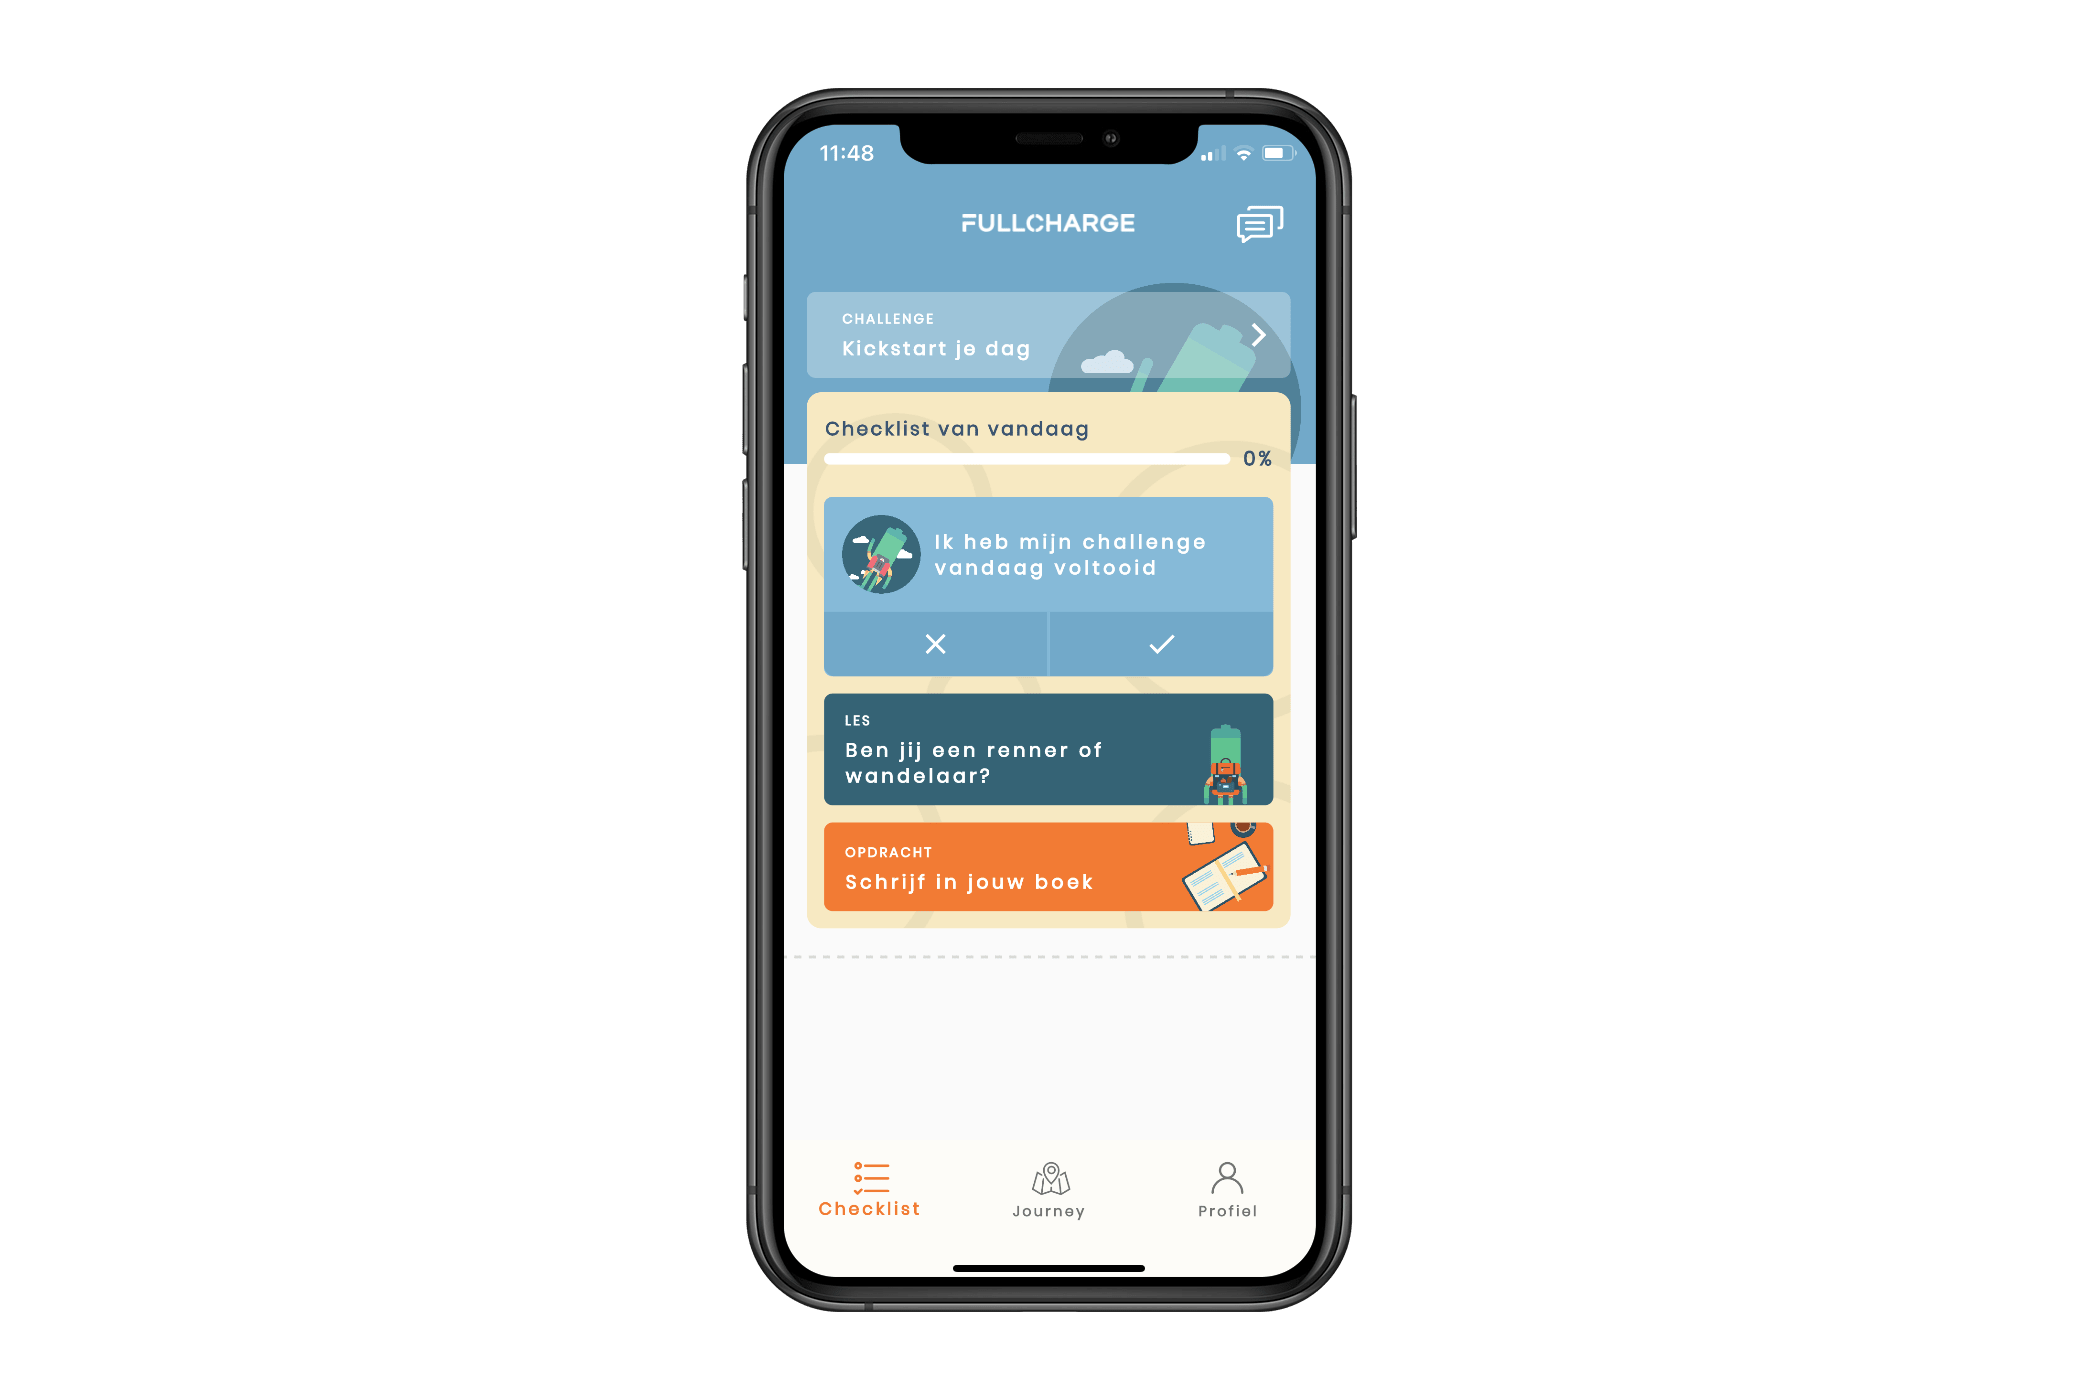 Fullcharge-screenshot-checklist